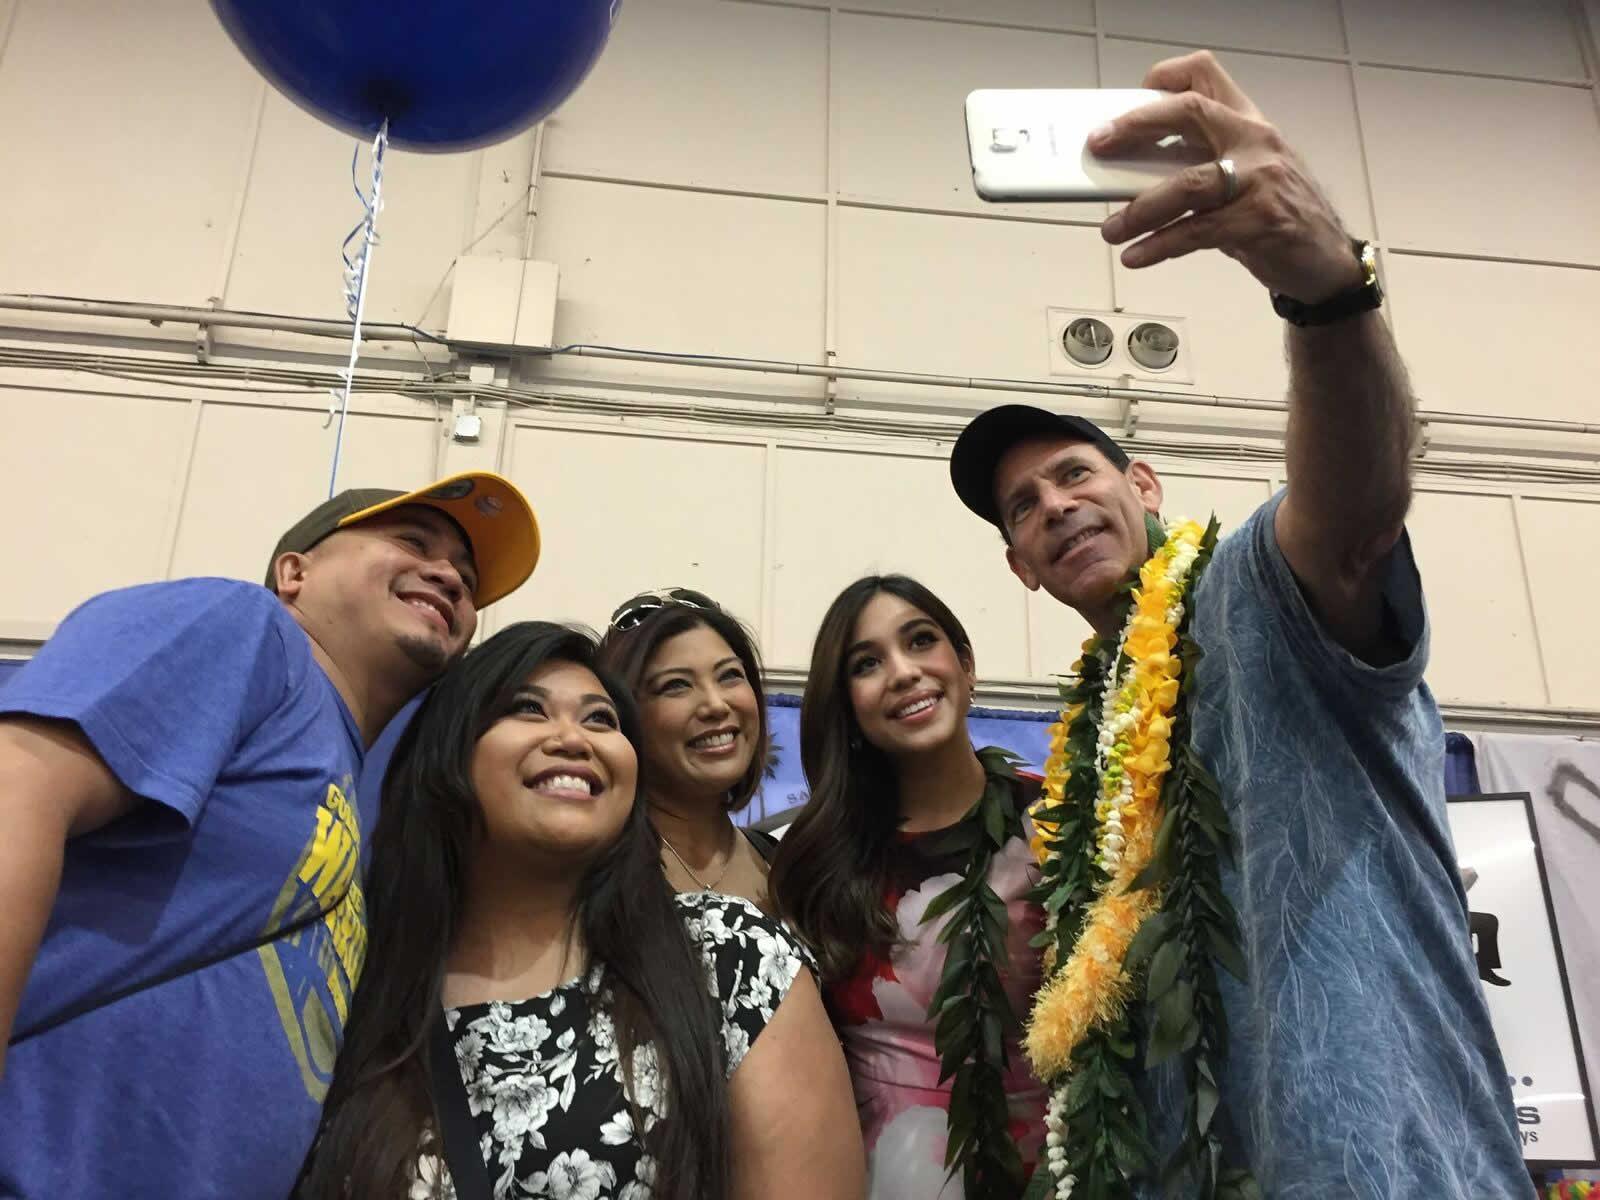 <div class='meta'><div class='origin-logo' data-origin='none'></div><span class='caption-text' data-credit='KGO-TV'>The Aloha Festival at the San Mateo County Event Center on Saturday, August 6, 2016.</span></div>